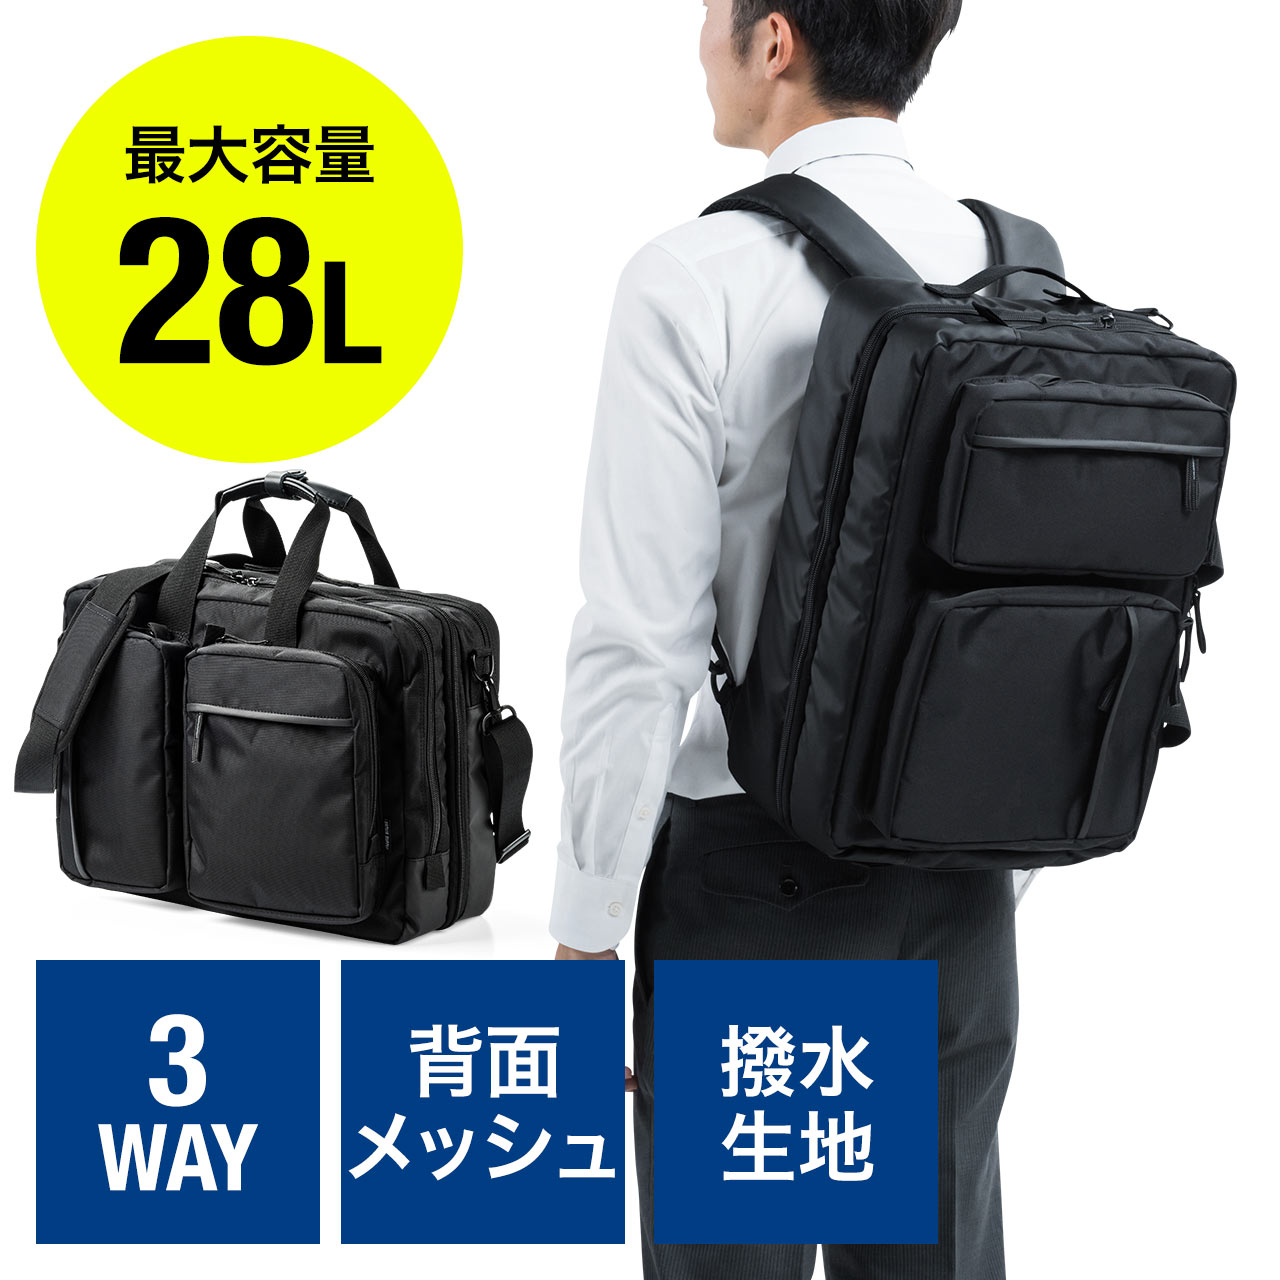 7cb6f0a6f31a 3WAYビジネスバッグ(リュック対応・メッシュ使用・大容量・28L) サン... 価格¥7,480